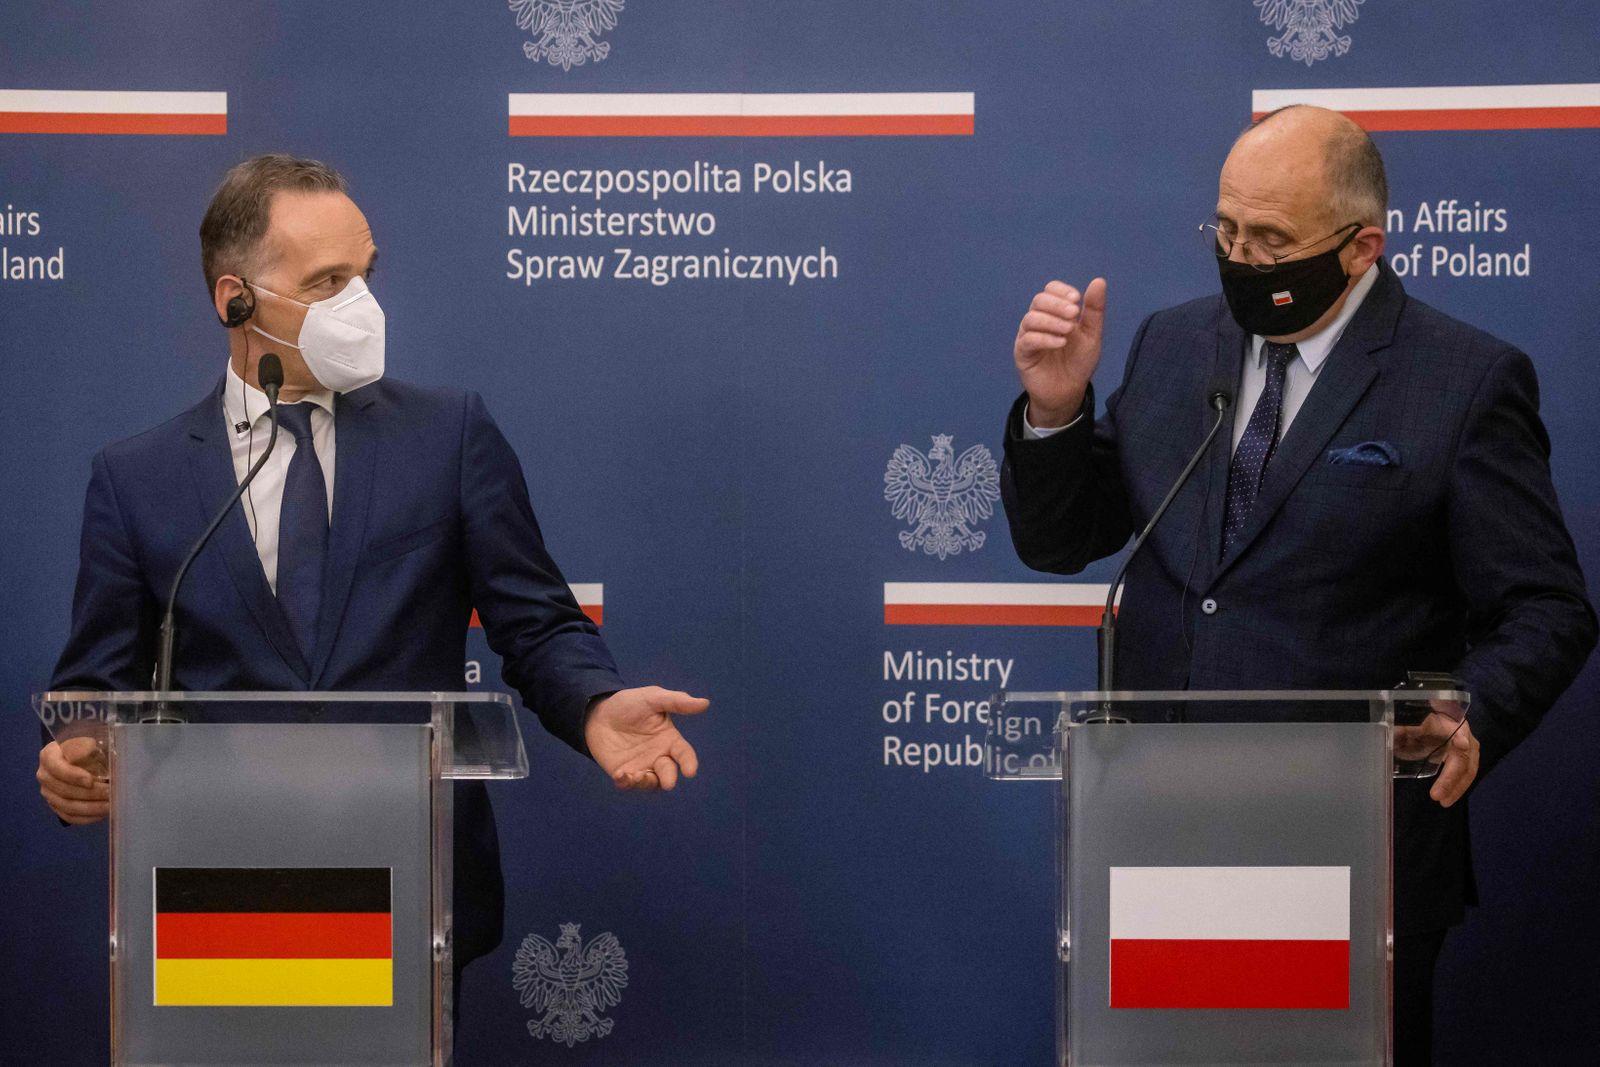 POLAND-GERMANY-POLITICS-DIPLOMACY